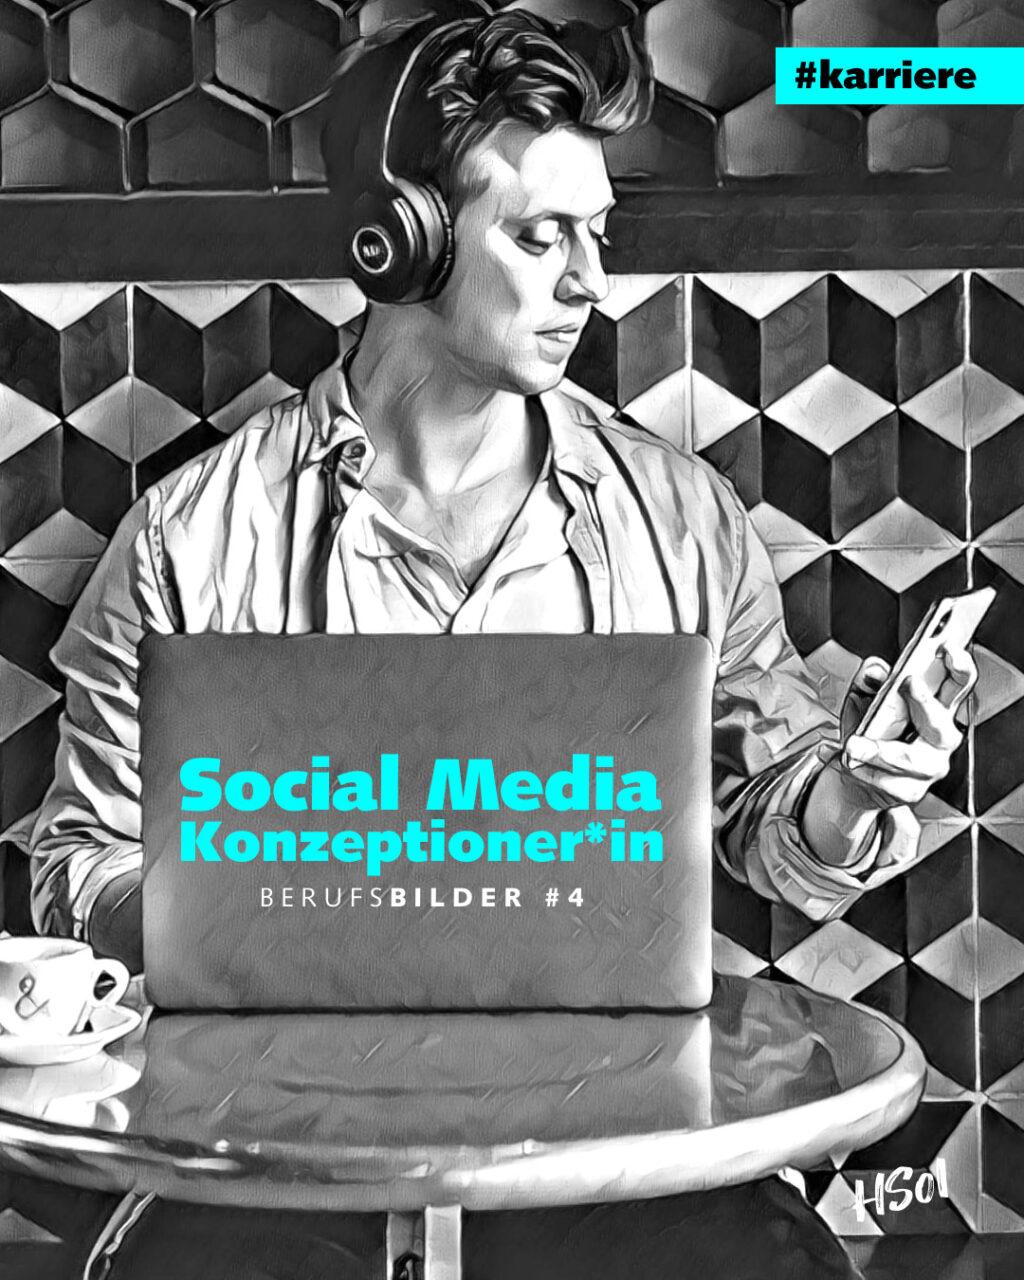 20210302_Berufsbild_No_4_Social_Media_Konzeptioner_V1